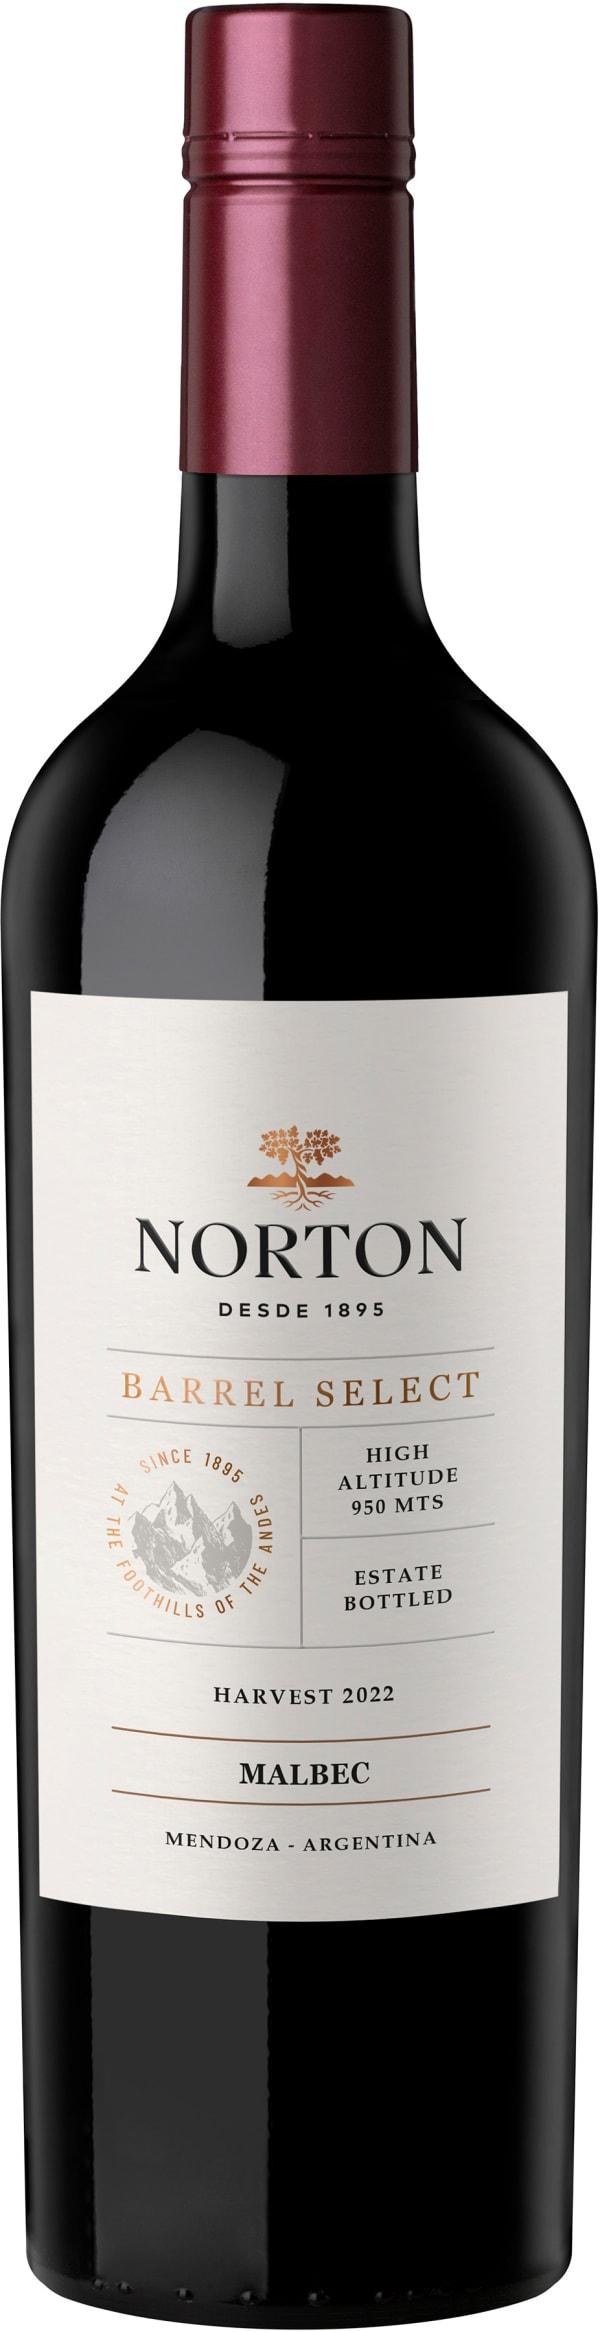 Norton Barrel Select Malbec 2019